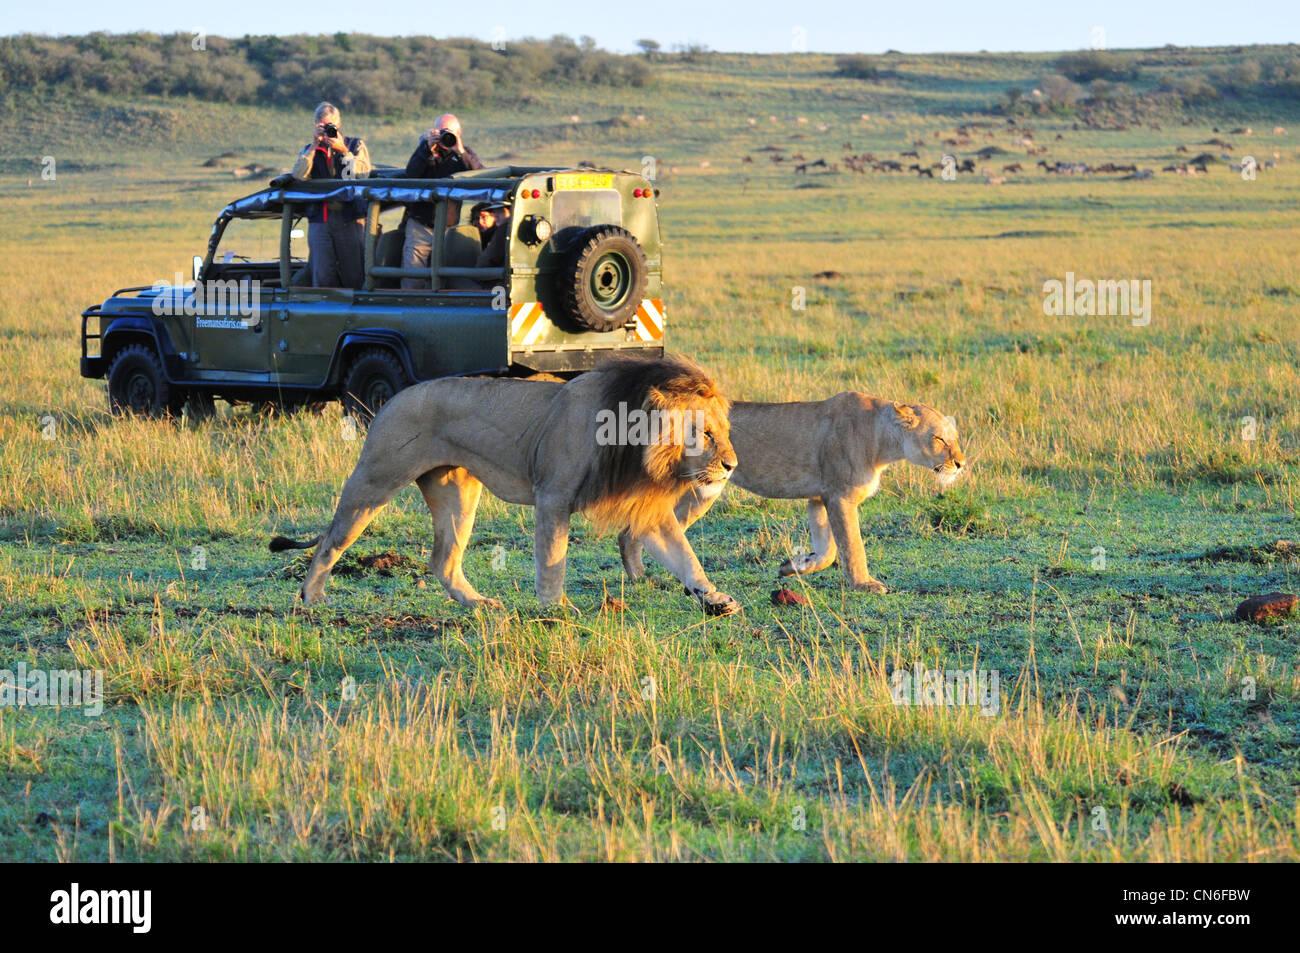 Safari, Masai Mara - Stock Image